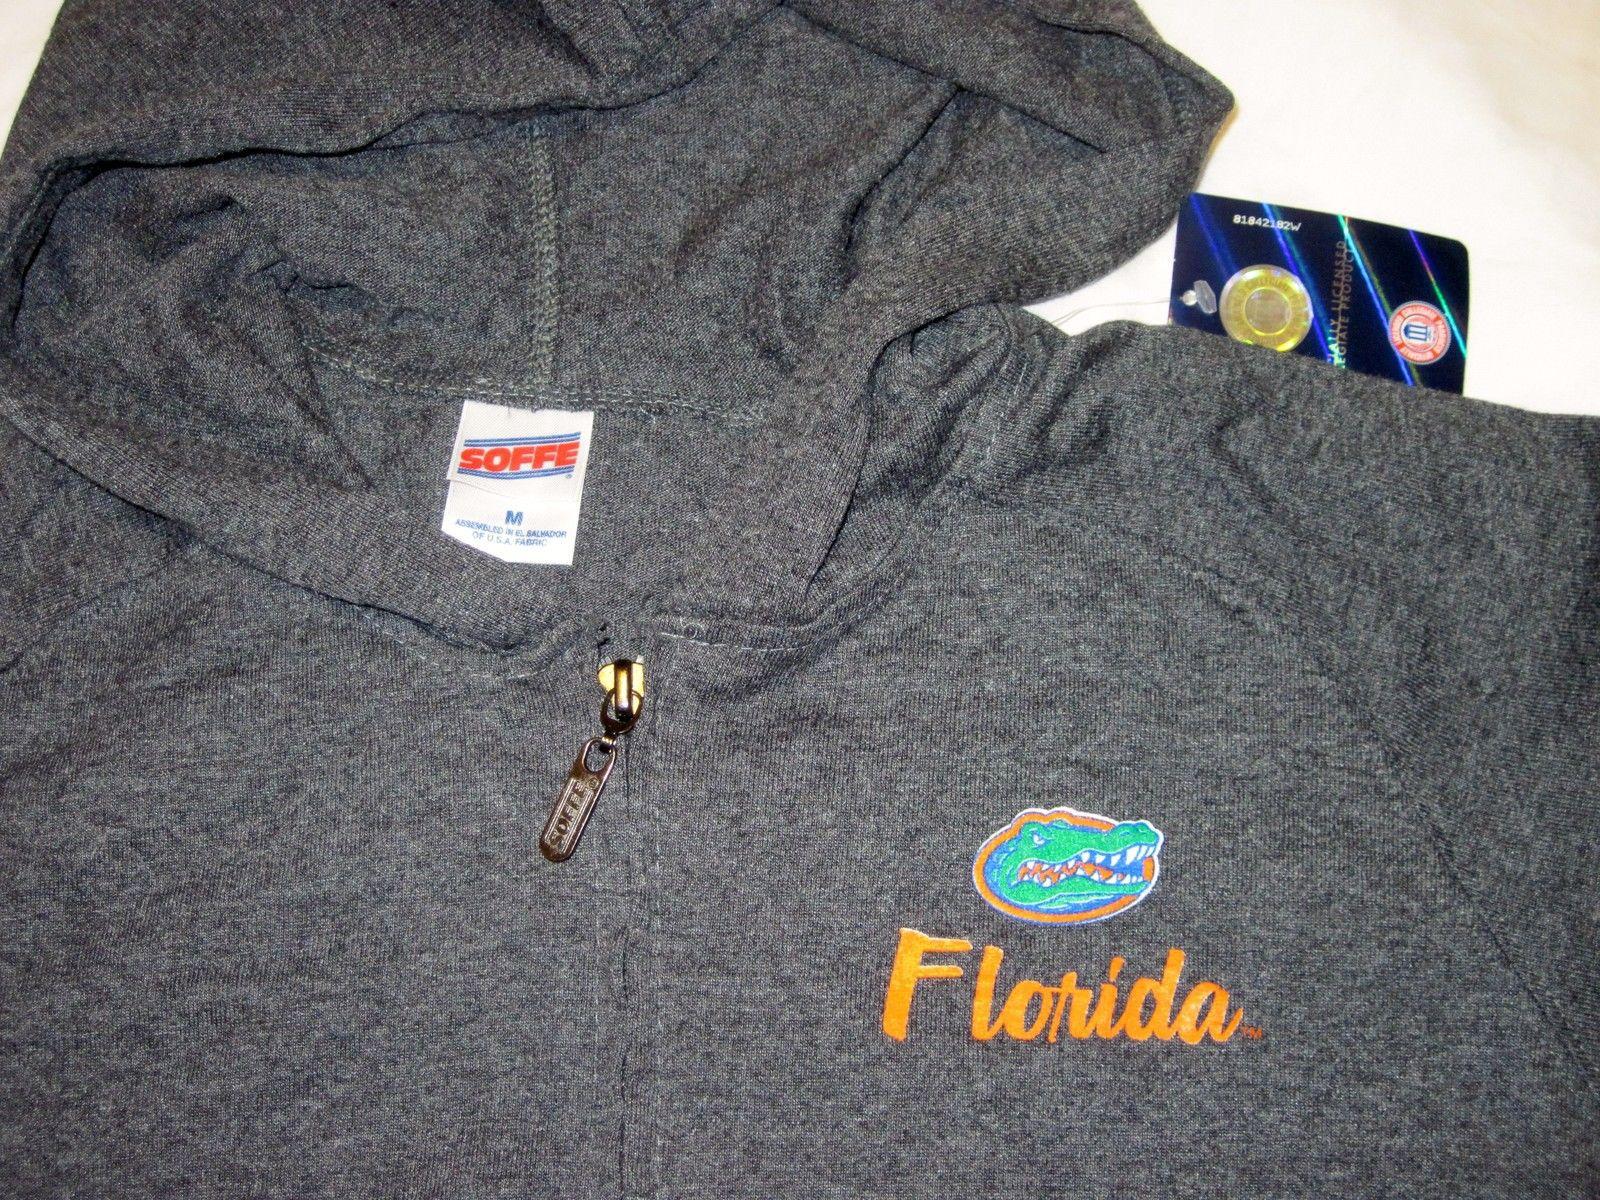 NWT University of Florida UF Gators Hoodie Zip Jacket Dark Gray Pockets by Soffe